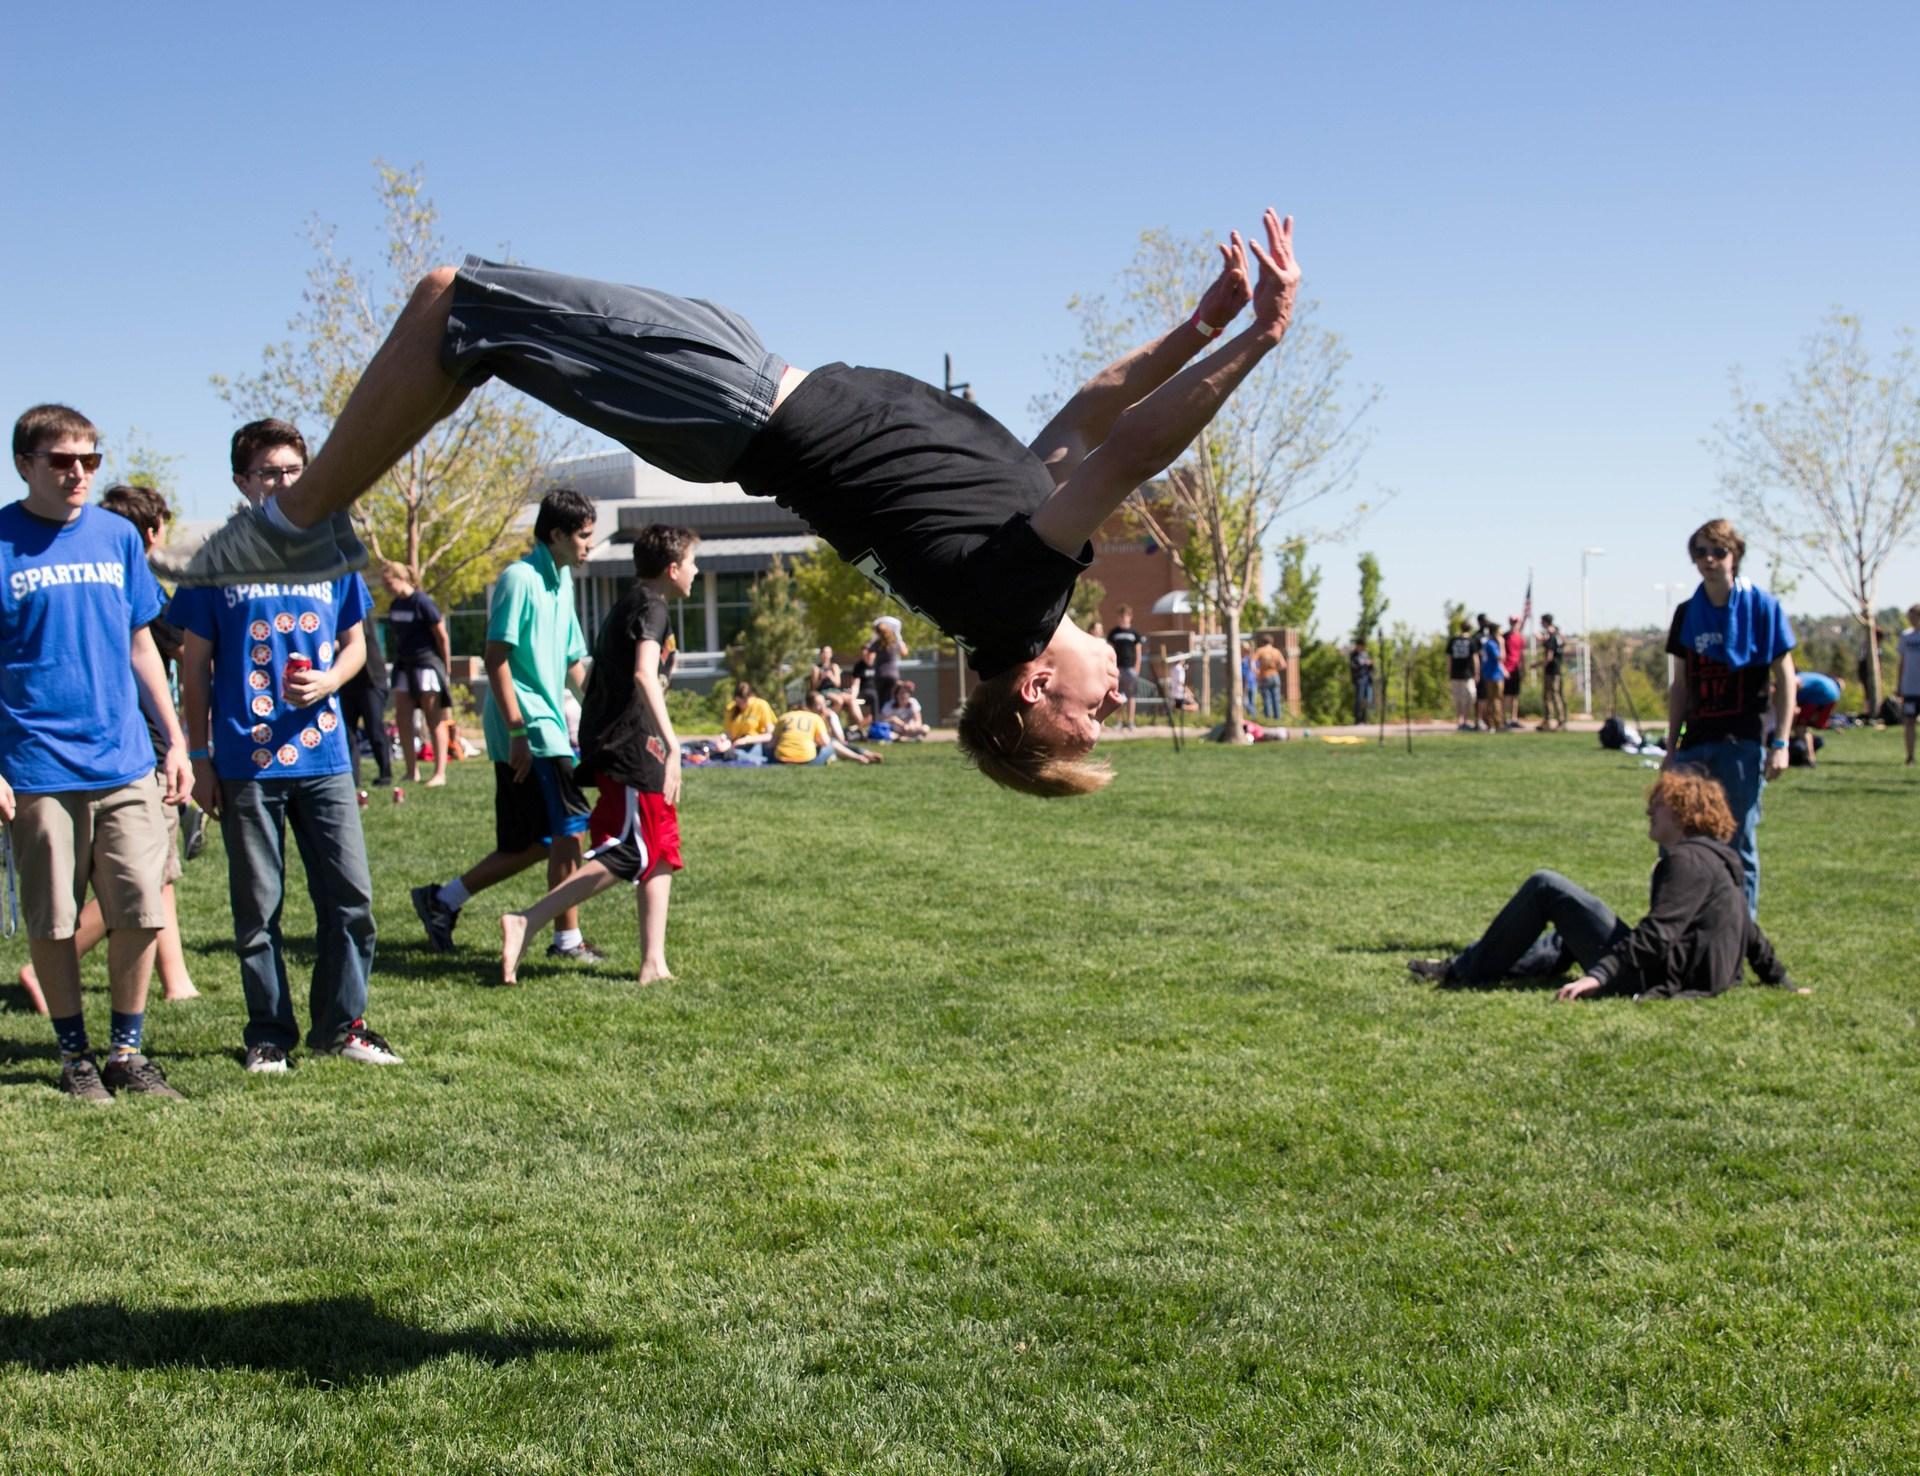 high school student doing a backflip